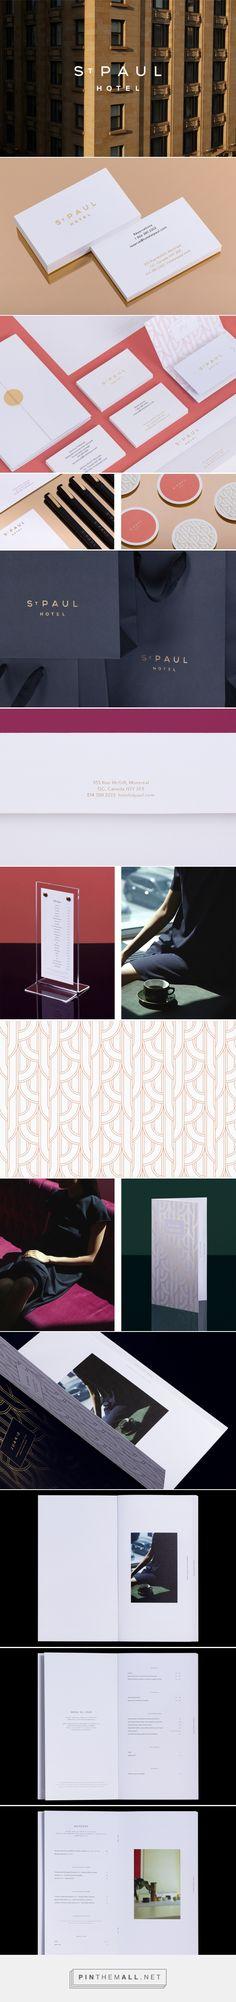 St Paul Hotel / Branding / Logo Design / Minimalist / Minimal / Art Deco / Pattern / Ideas / Inspiration / Business / Hospitality / Modern / Elegant / Timeless / Brand Identity / Brand Design / Luxury / Hotel /